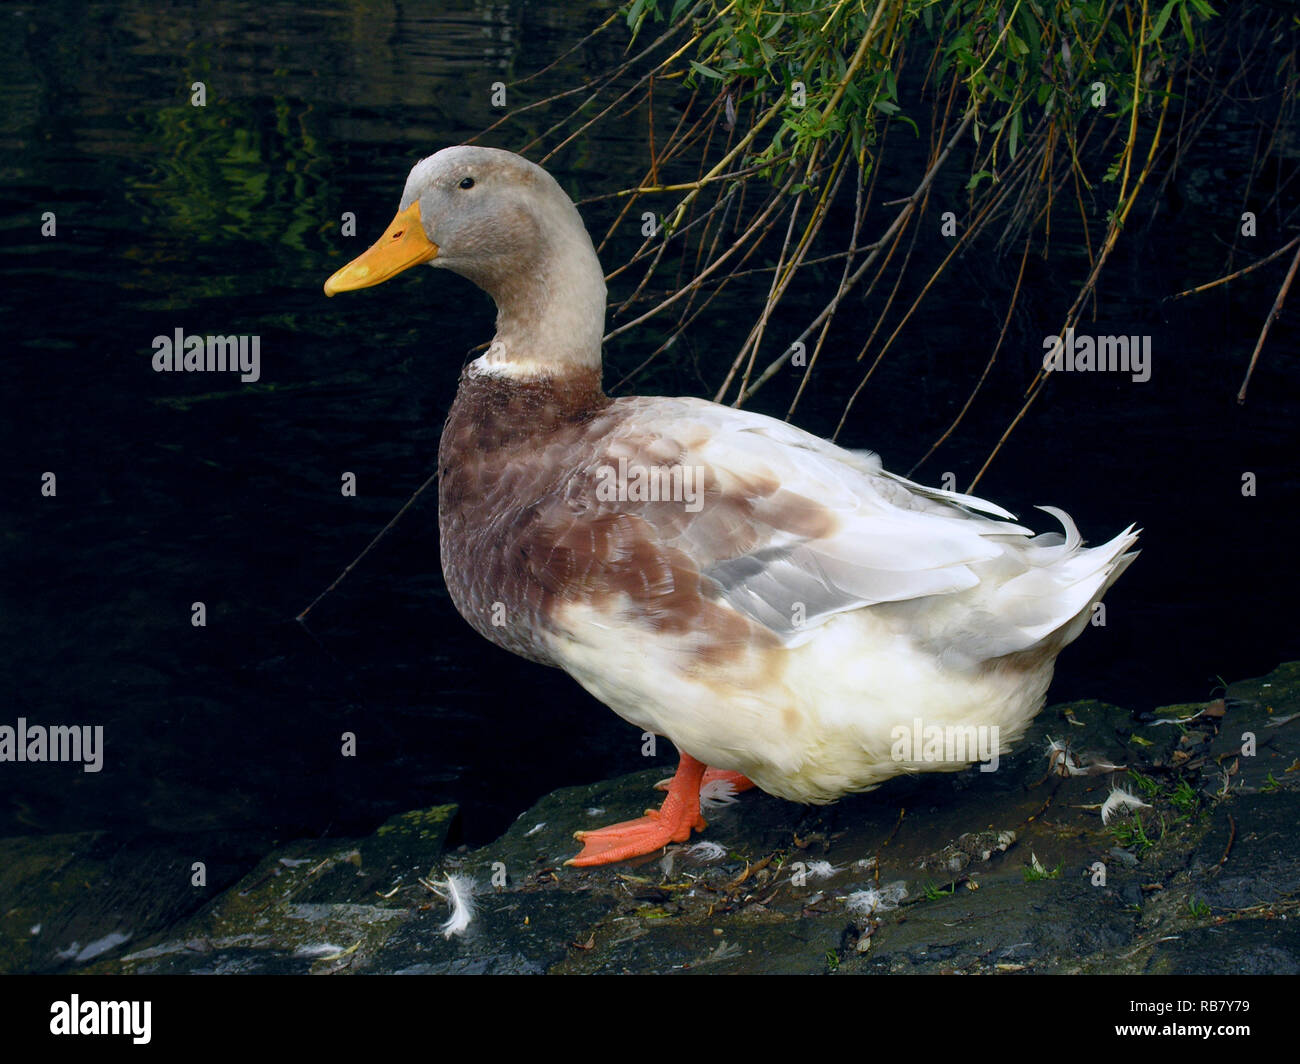 Saxony Duck Stock Photos & Saxony Duck Stock Images - Alamy